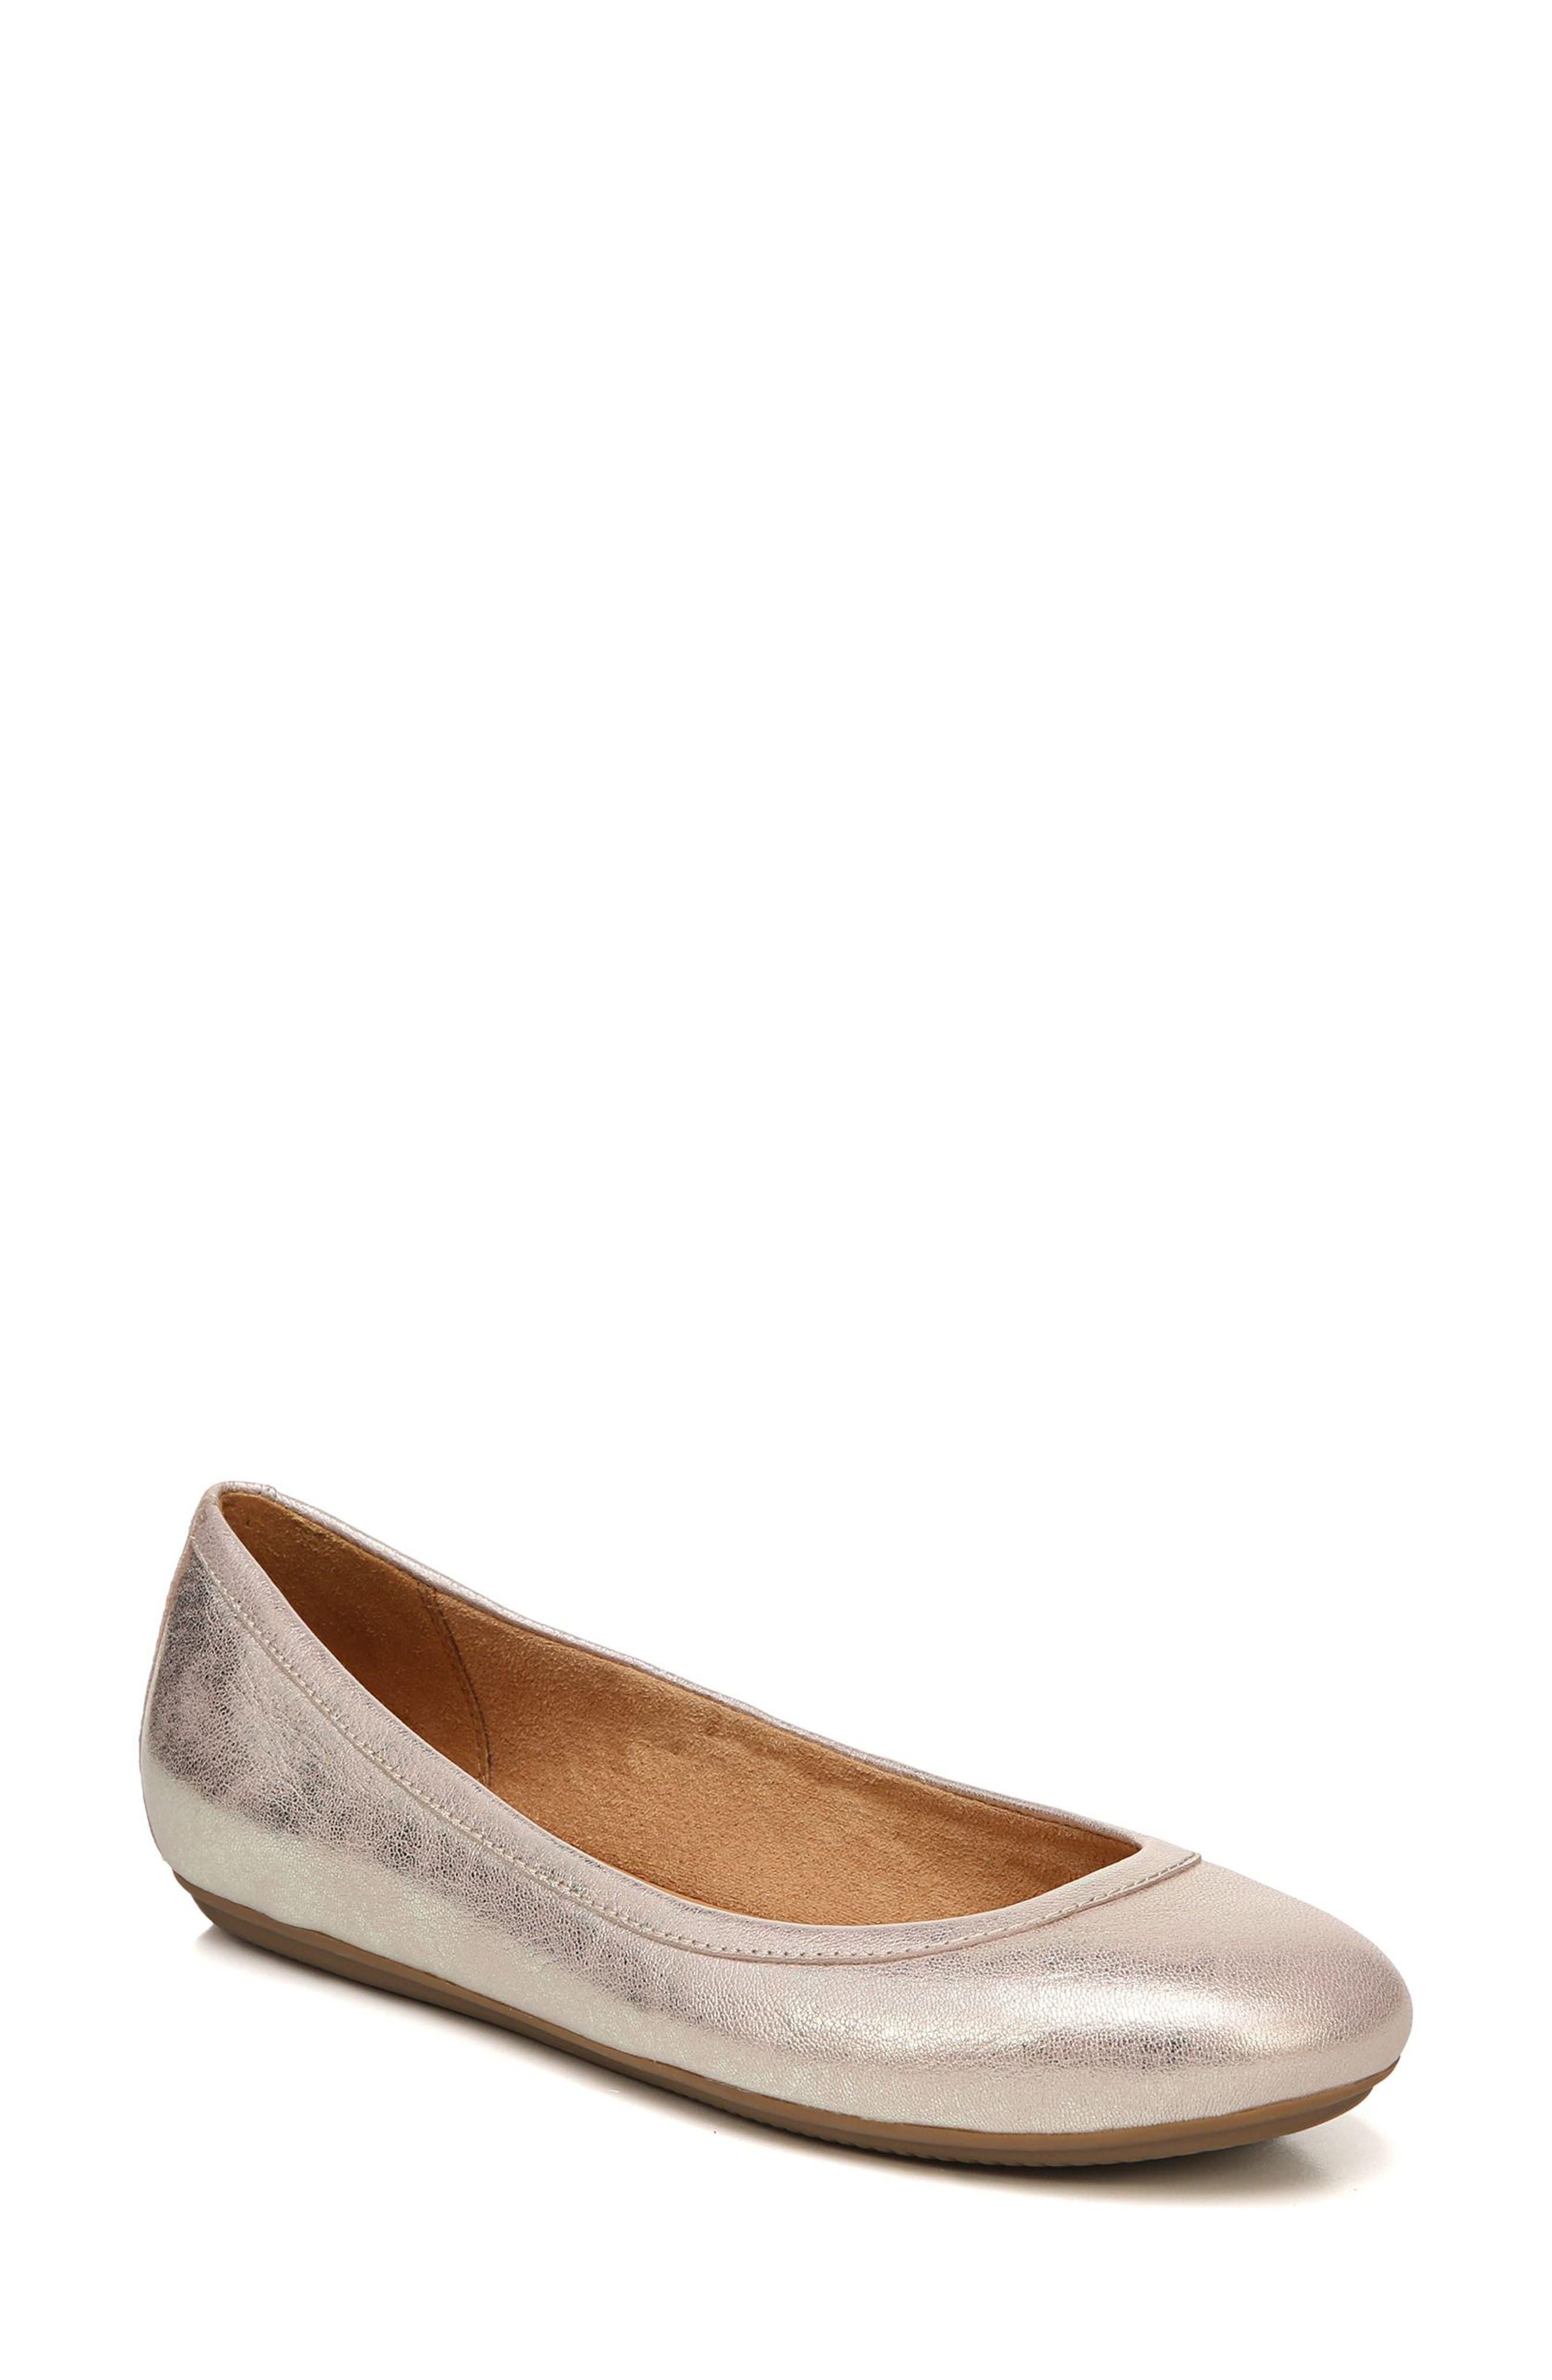 Main Image - Naturalizer Brittany Ballet Flat (Women)